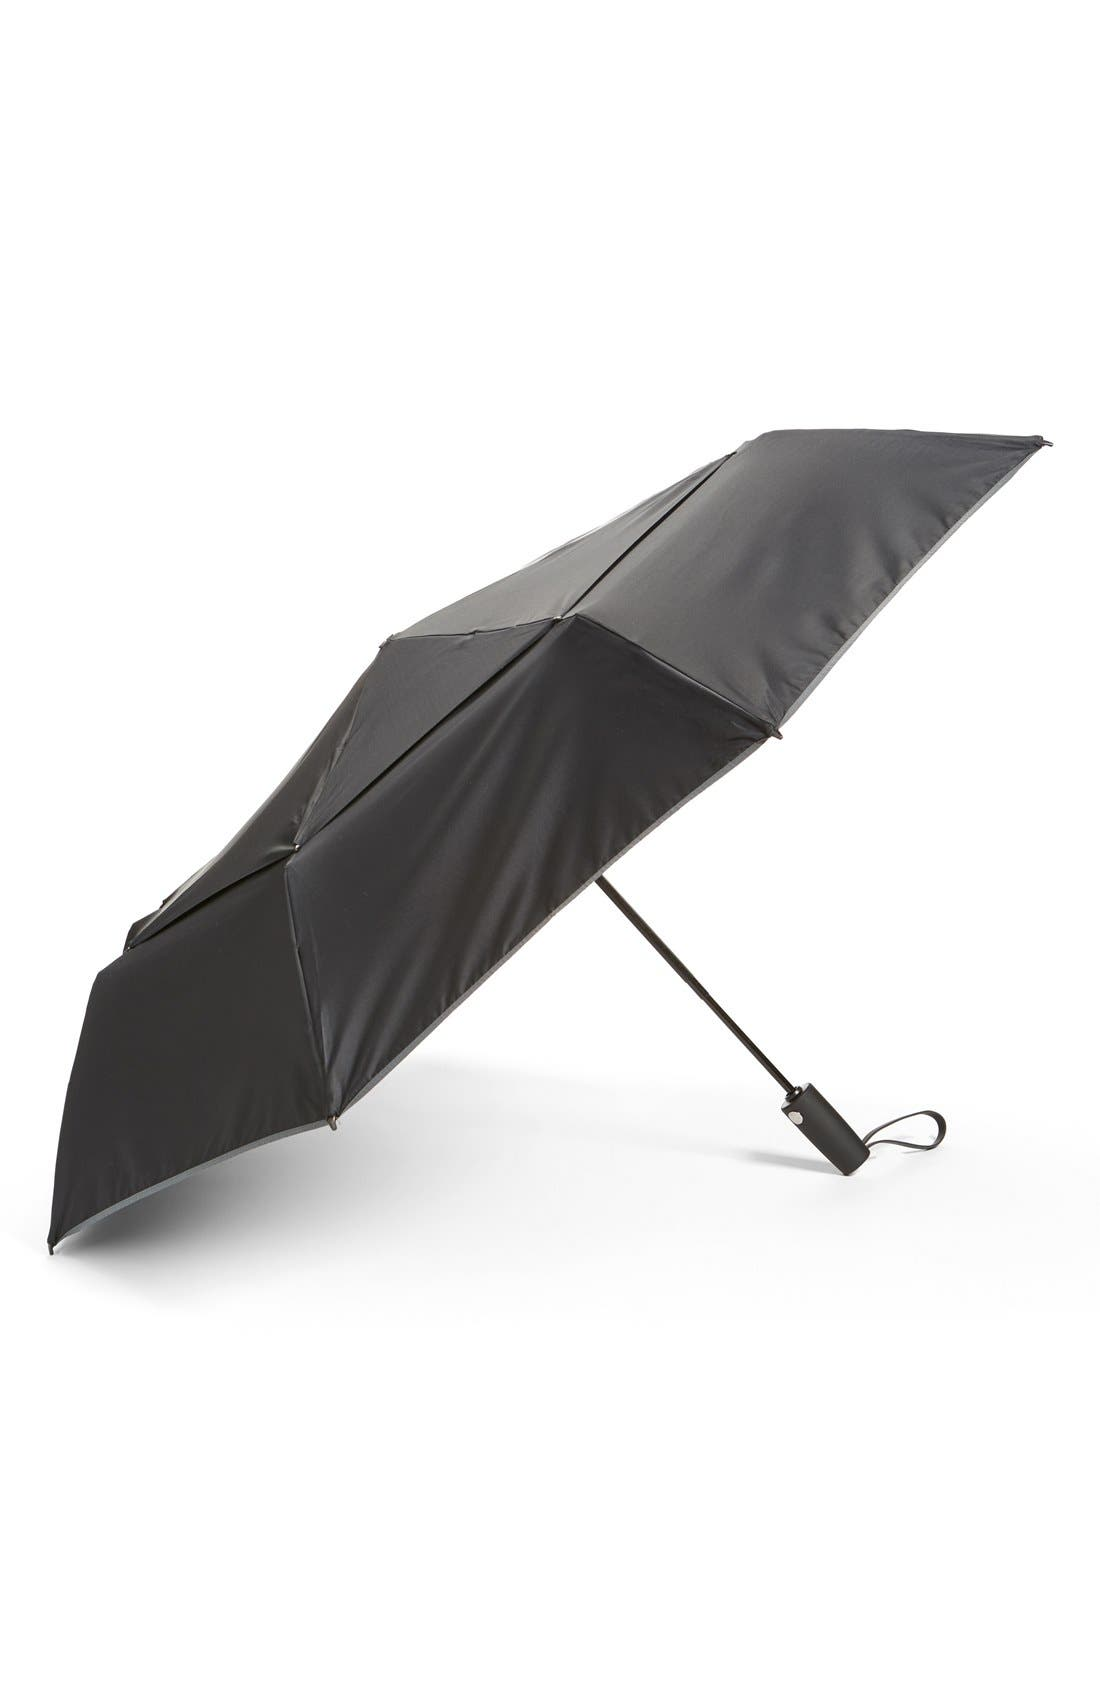 Alternate Image 1 Selected - Tumi Large Auto Close Umbrella